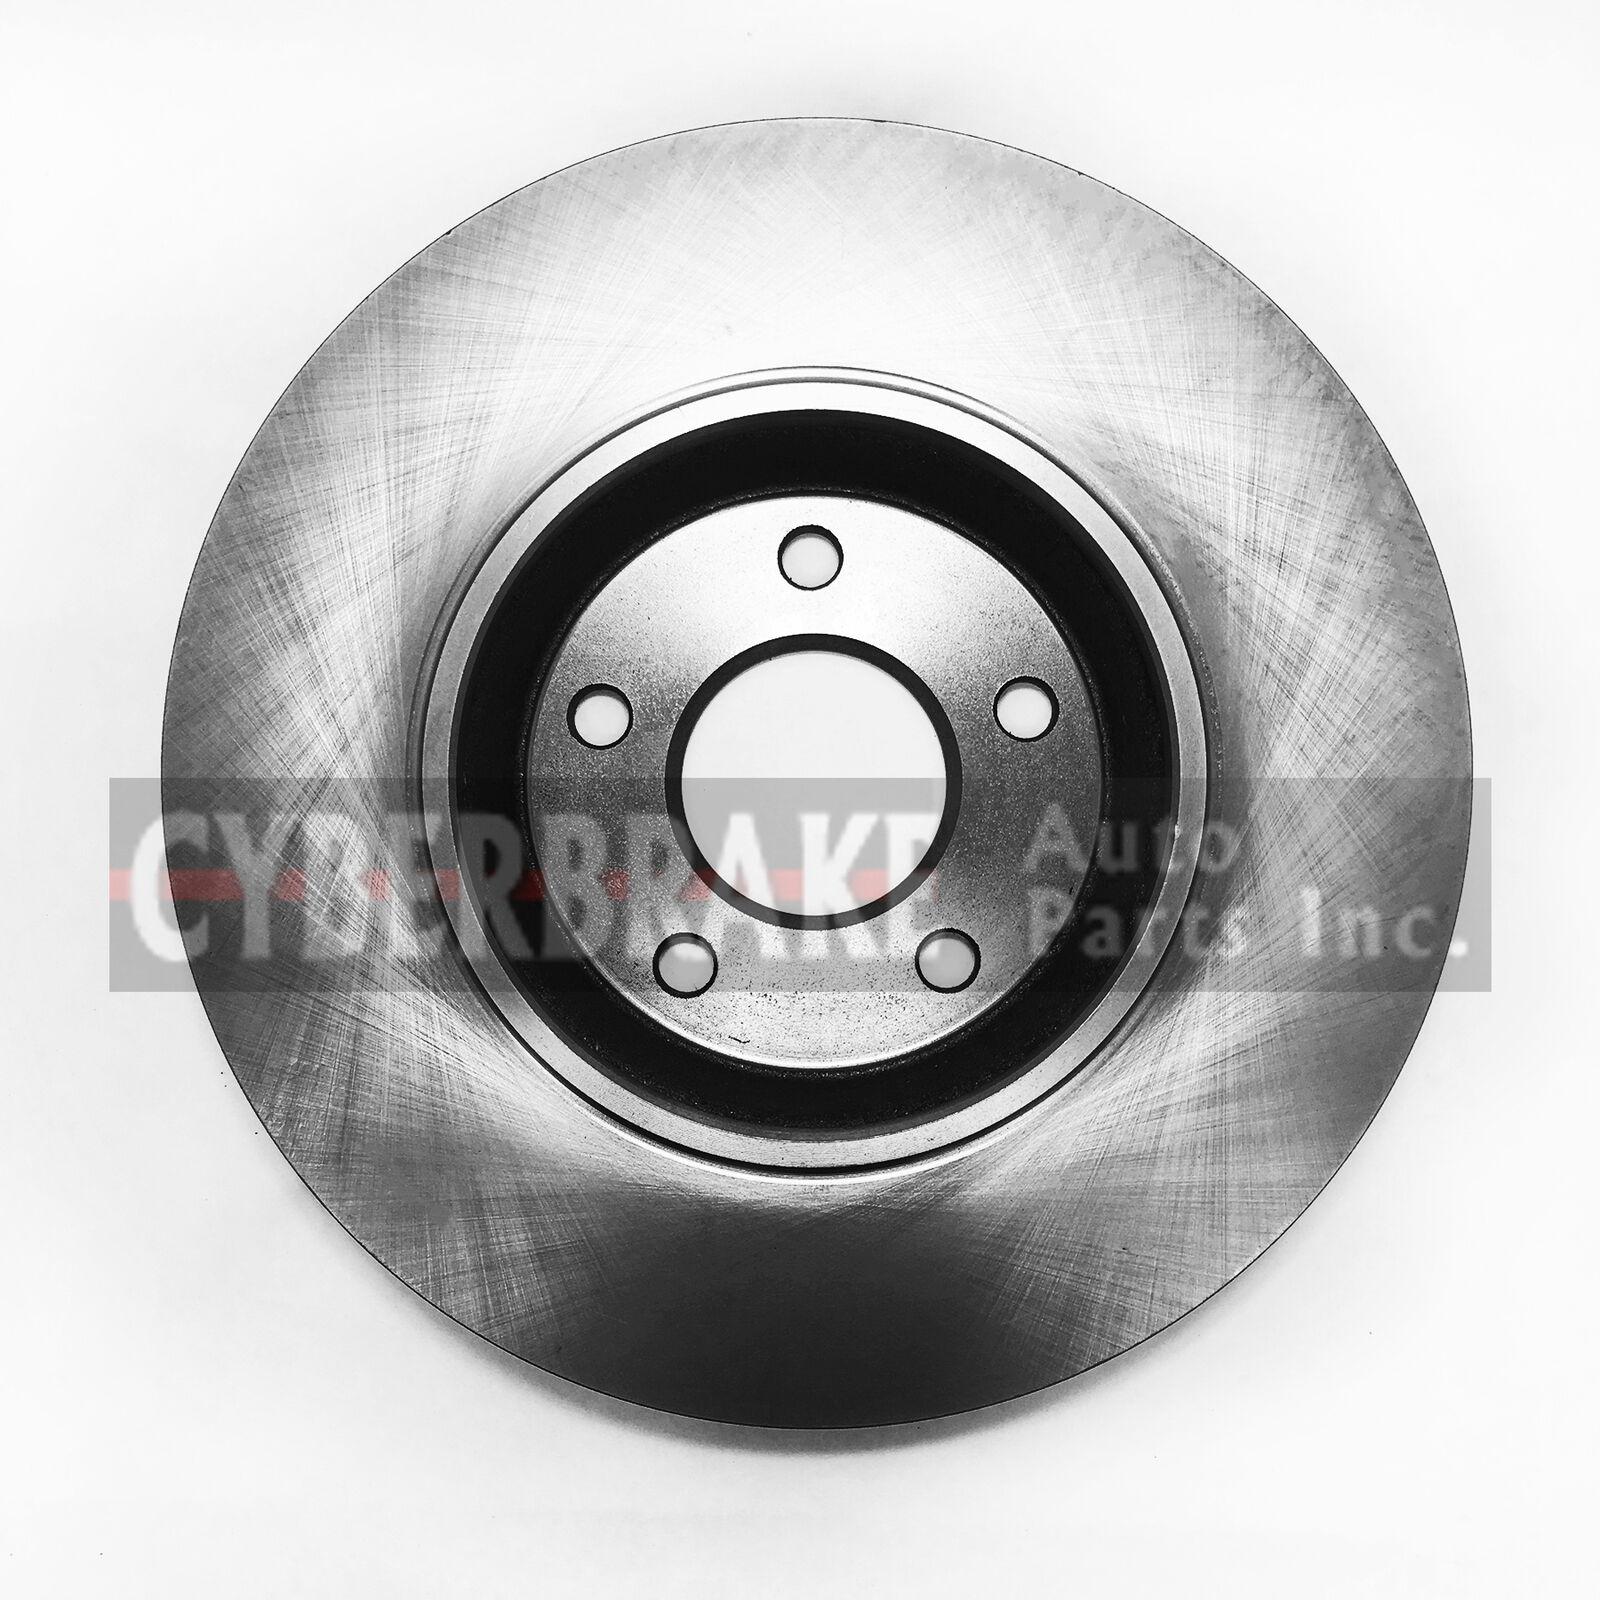 55093 FRONT Brake Rotor Pair of 2 Fits 07-09 Pontiac G5